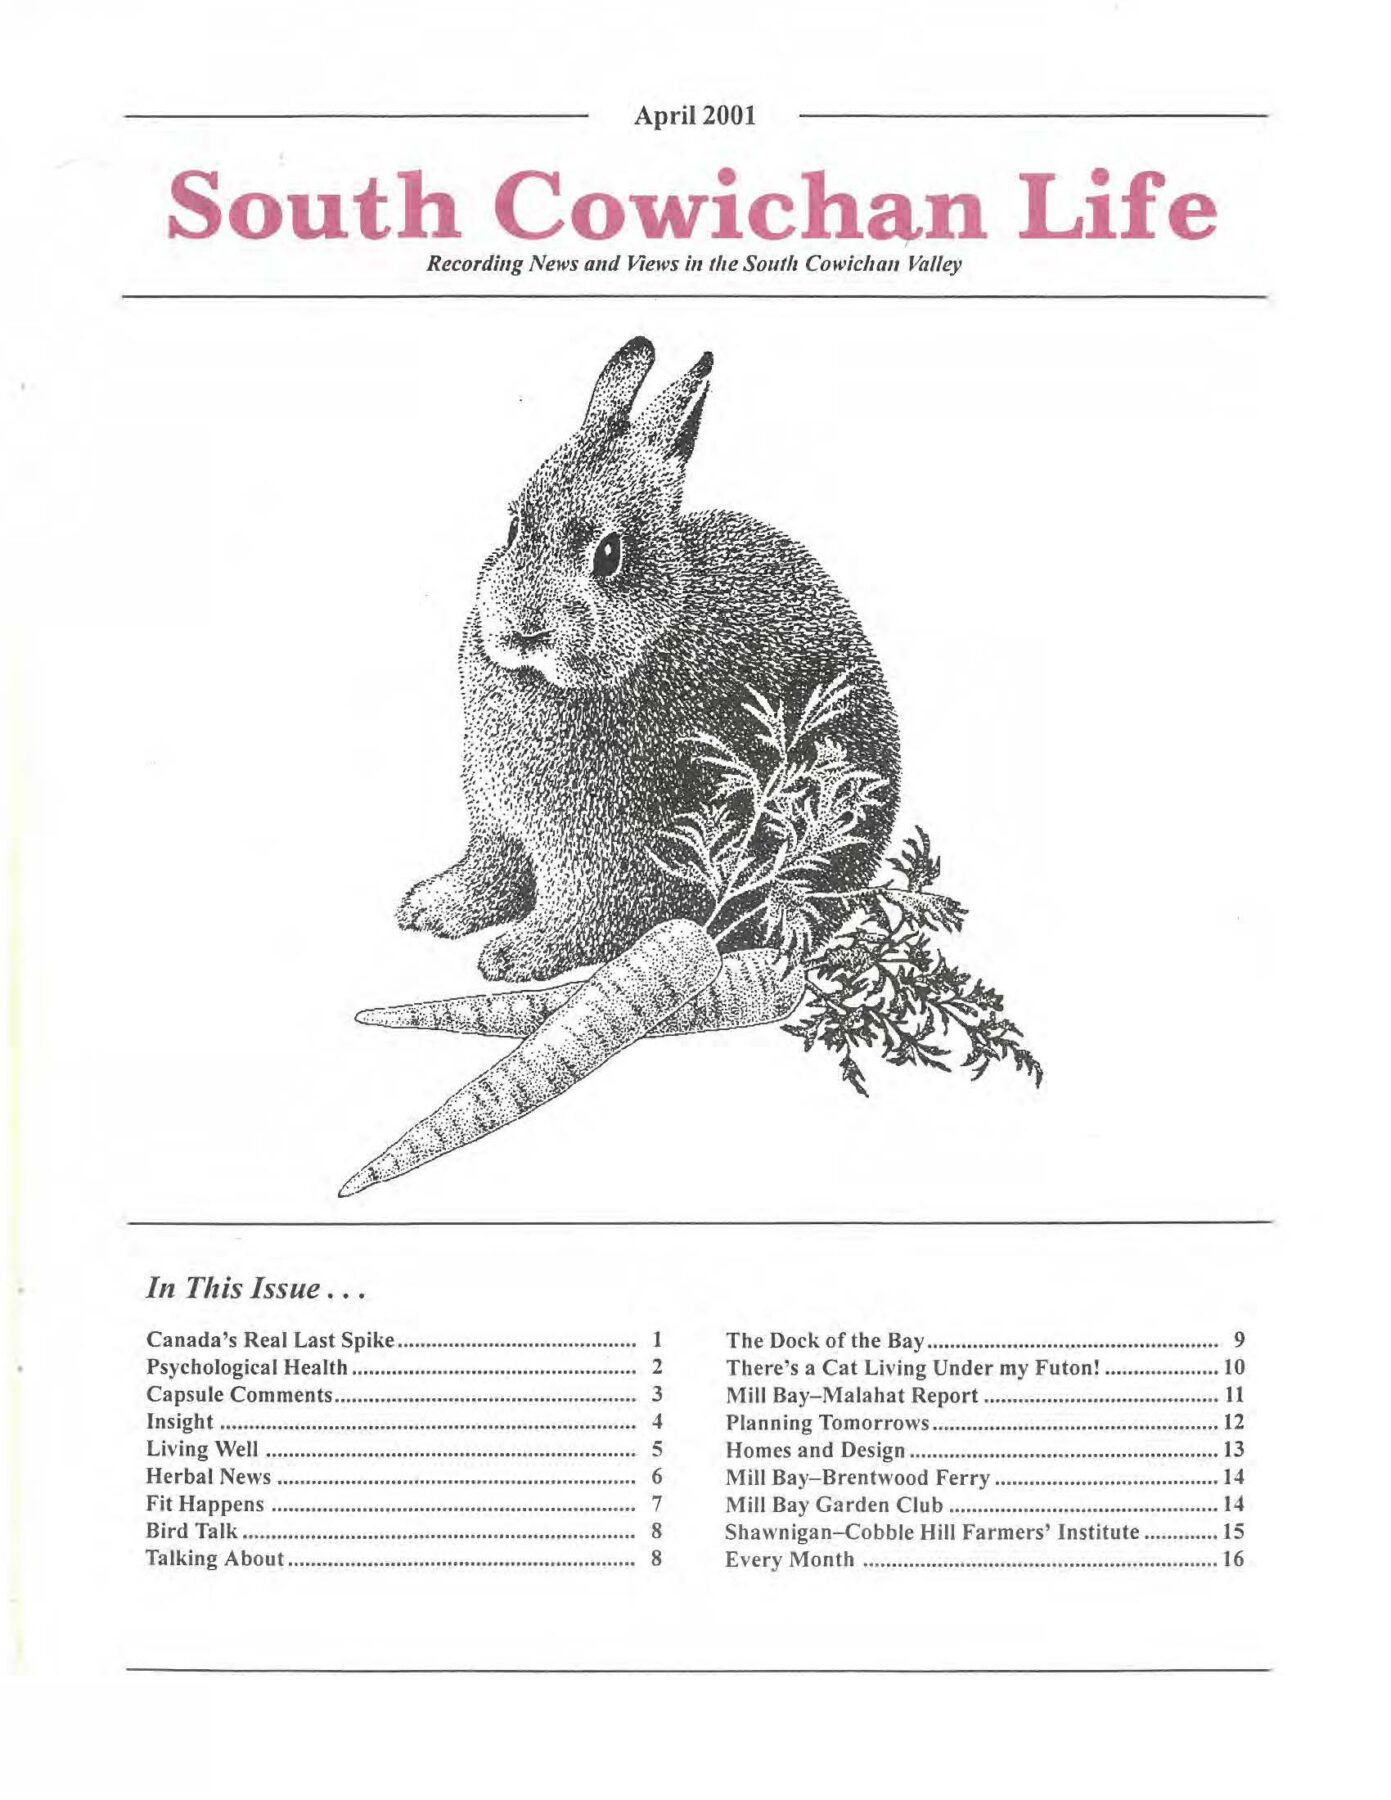 South Cowichan Life April 2001